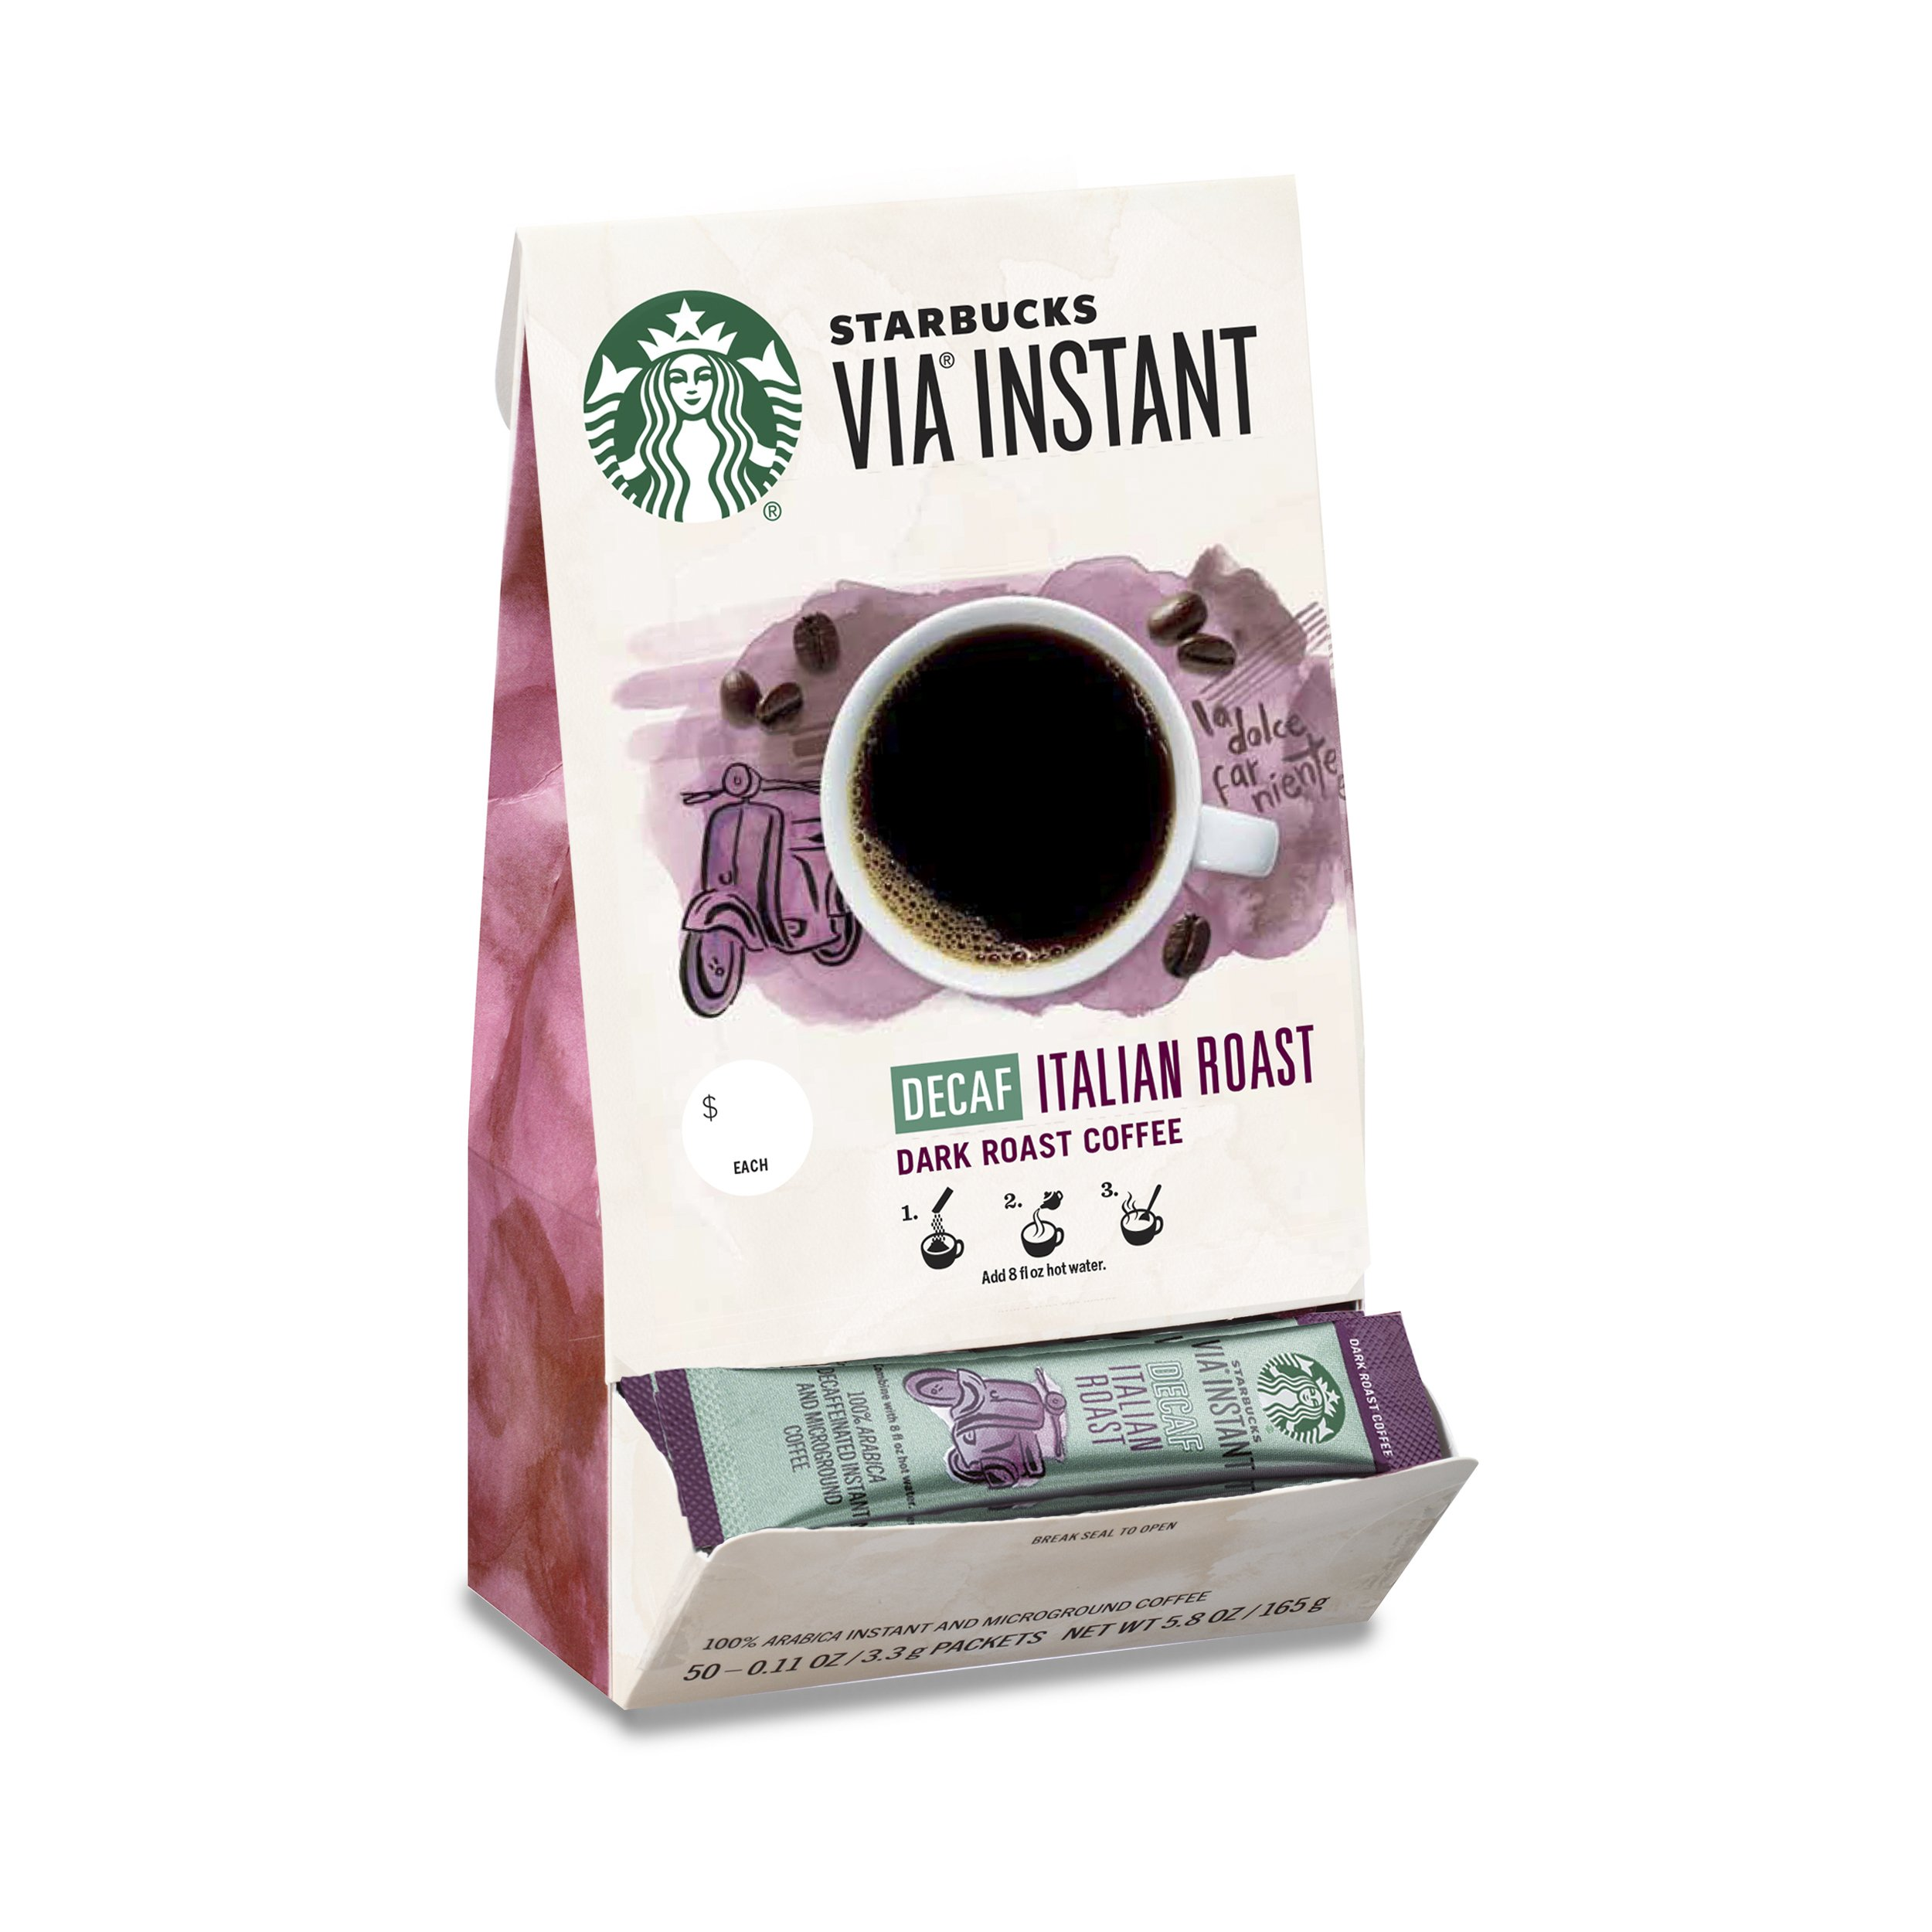 Starbucks VIA Instant Decaf Italian Roast Dark Roast Coffee (1 box of 50 packets) by Starbucks